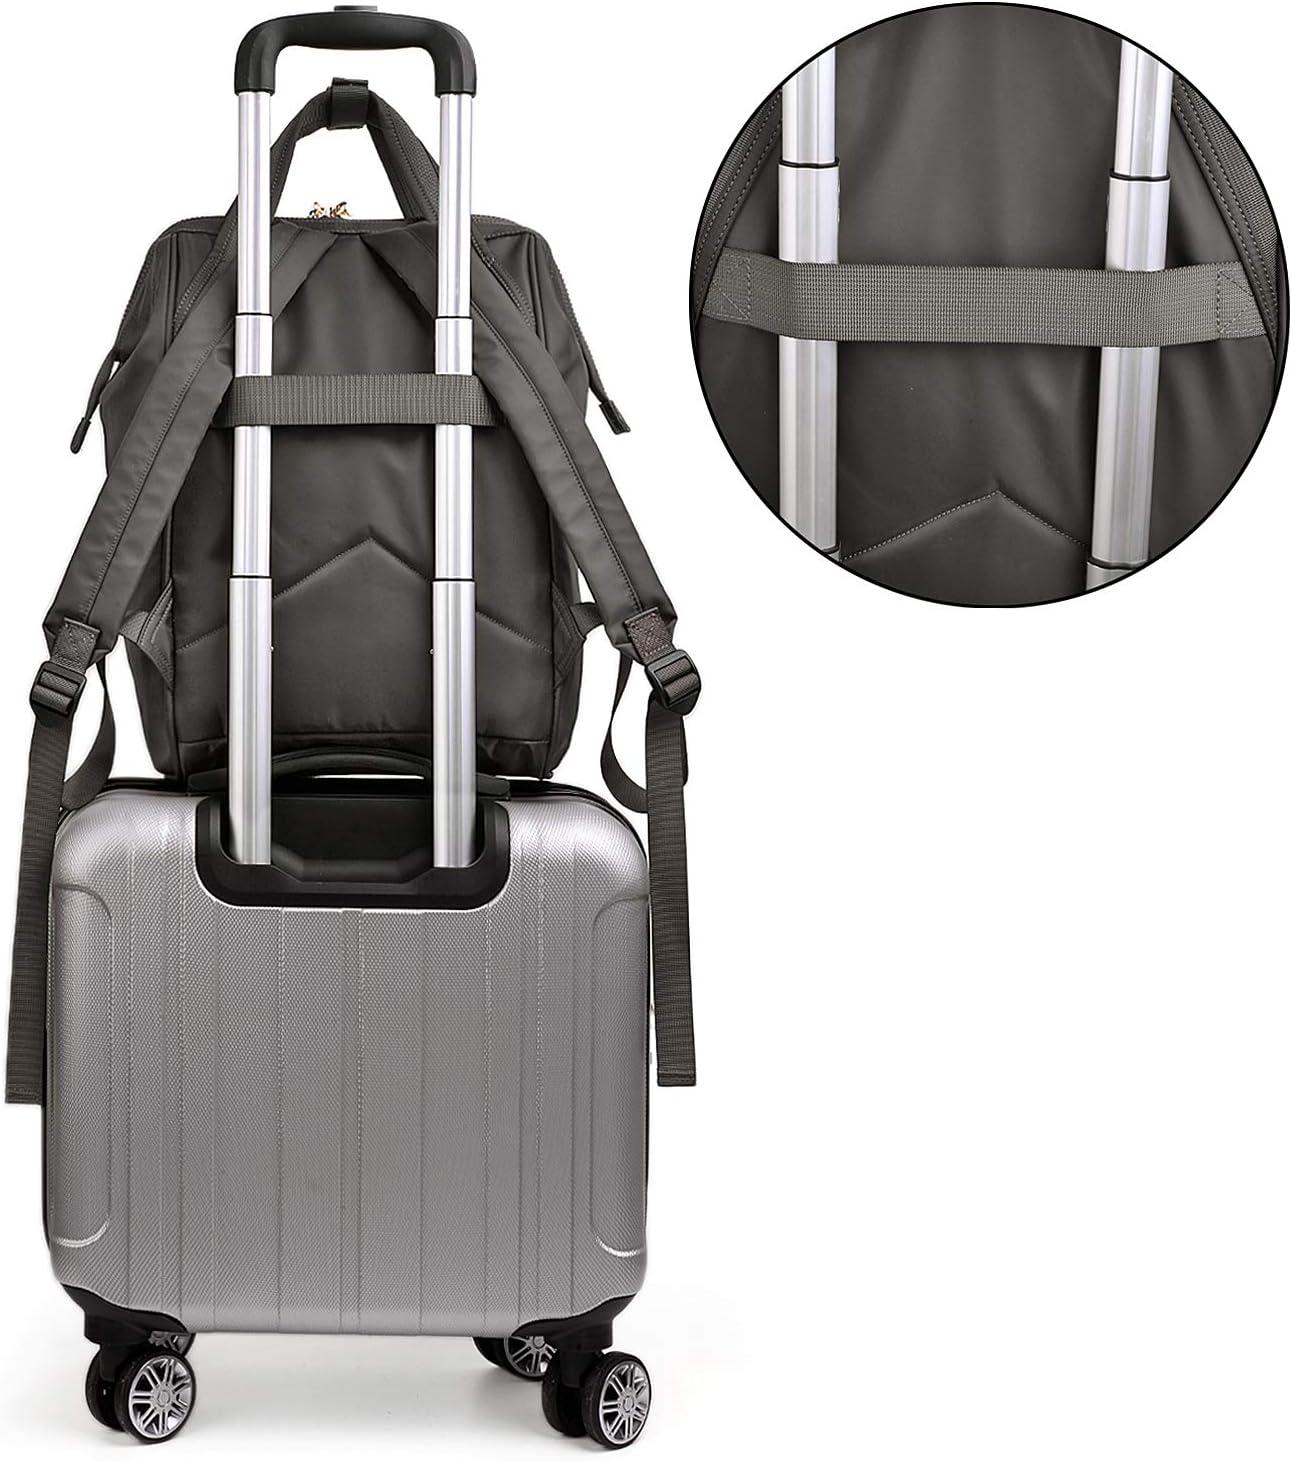 UTO Unisex Anti-Theft Travel Backpack School Bag Water Resistant Lightweight Nylon Grey